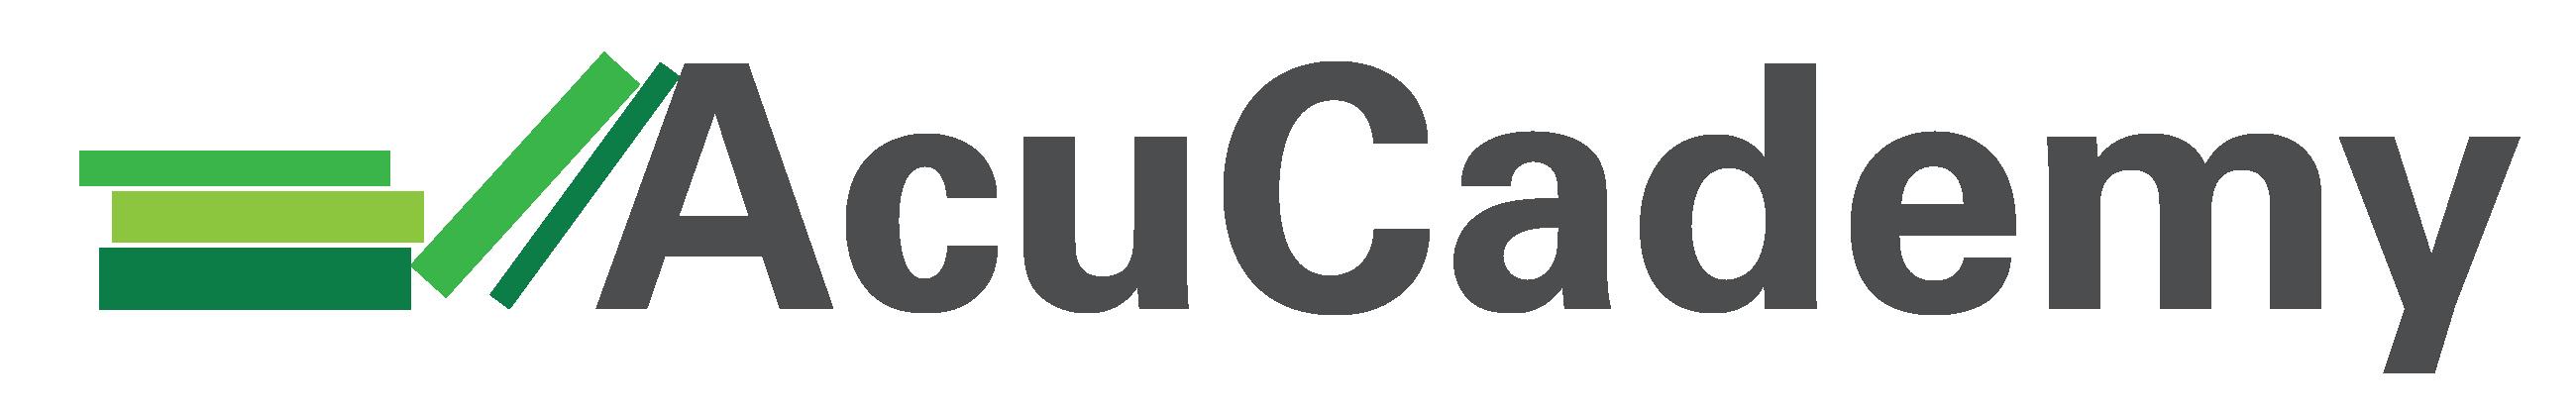 AcuCademy Sticky Logo Retina